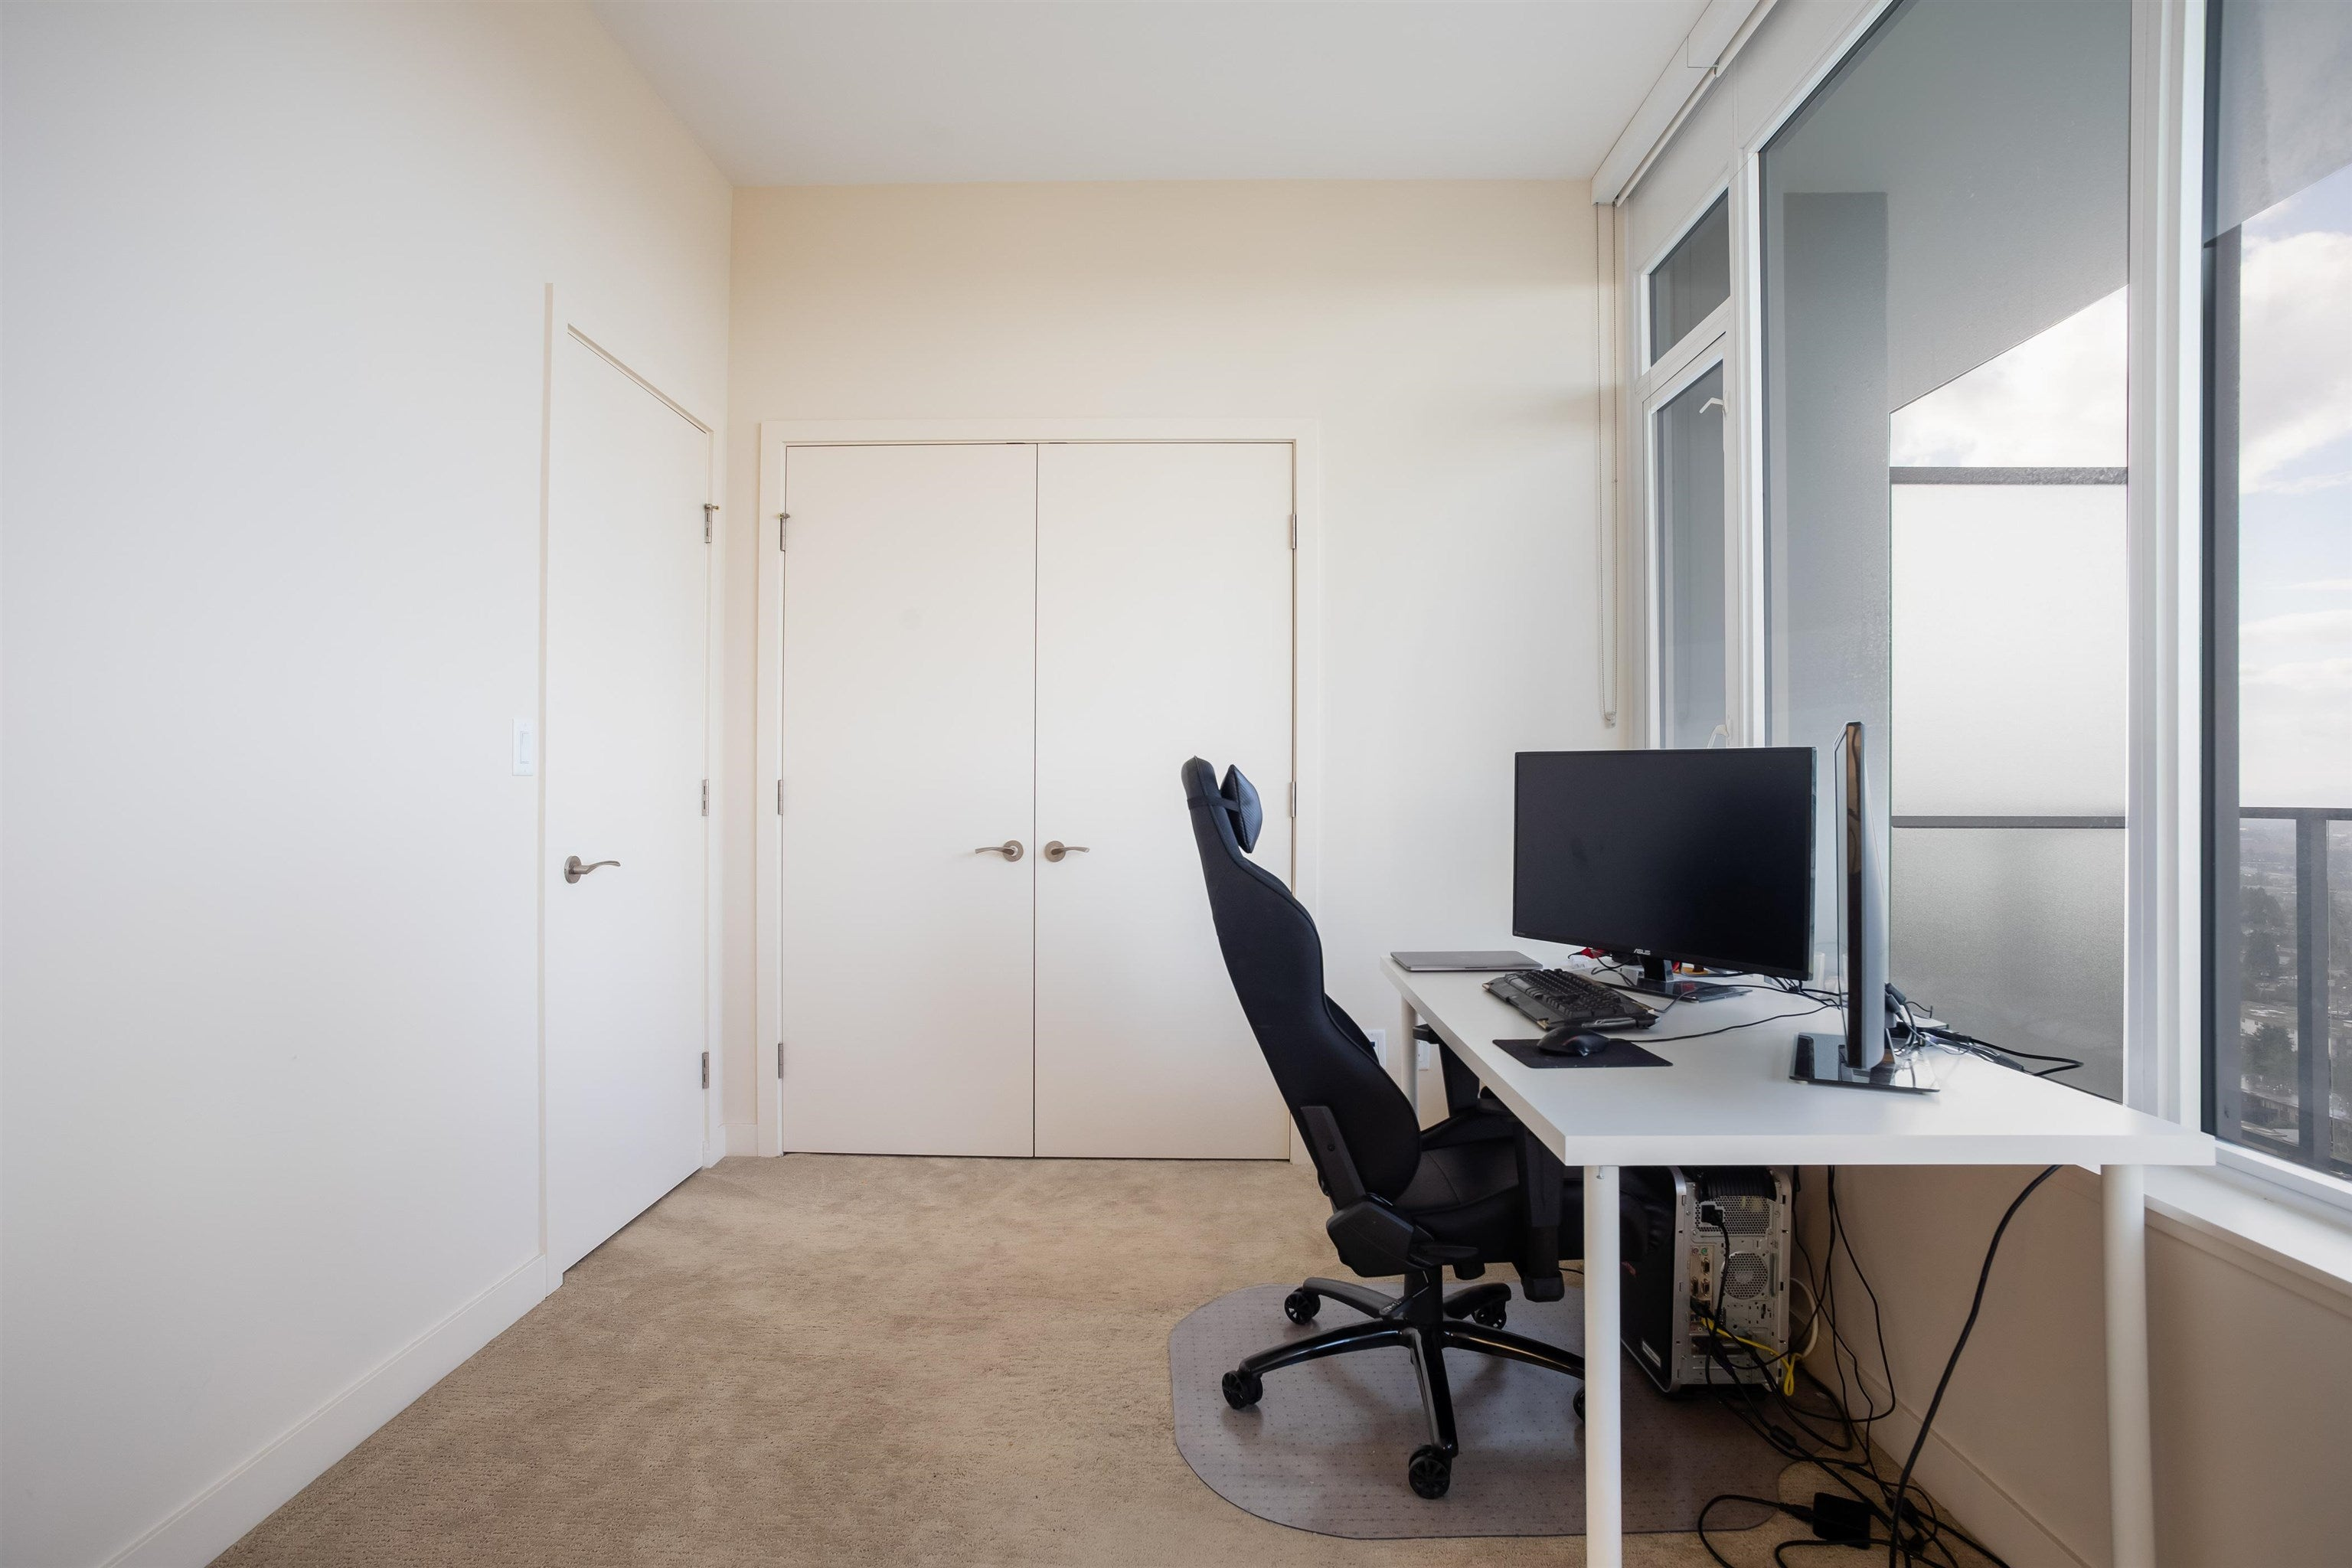 2206 6383 MCKAY AVENUE - Metrotown Apartment/Condo for sale, 2 Bedrooms (R2625647) - #16